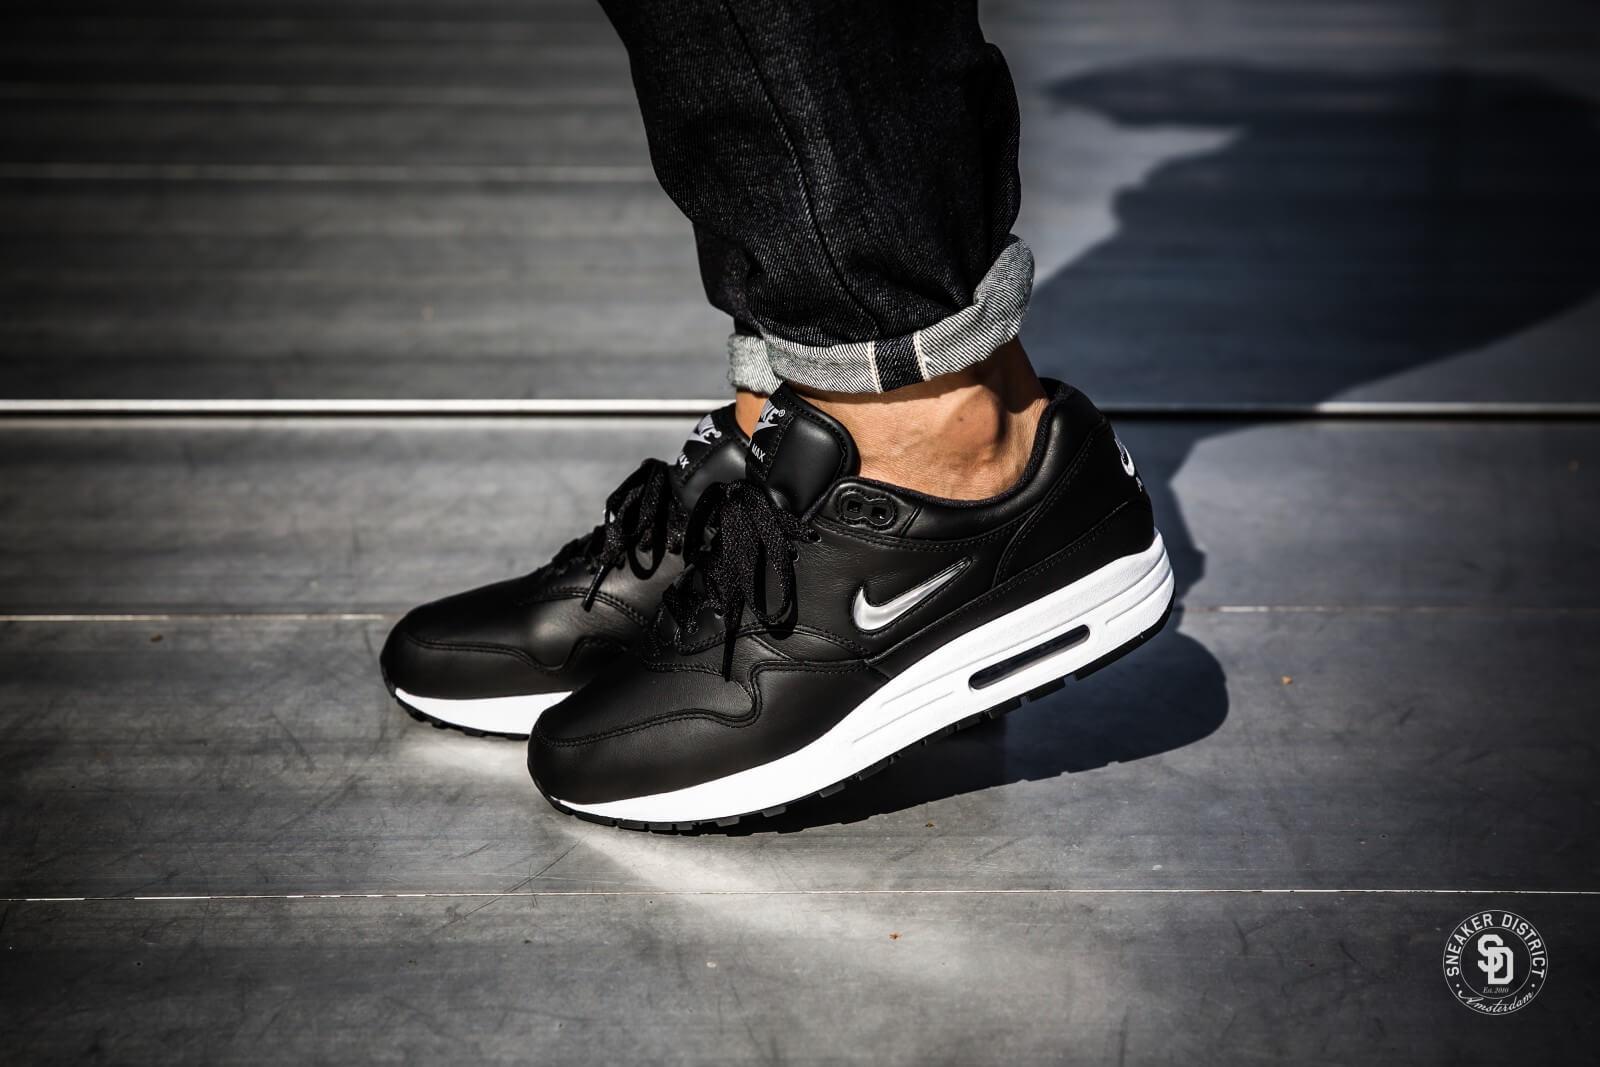 Nike Air Max 1 Premium SC Black